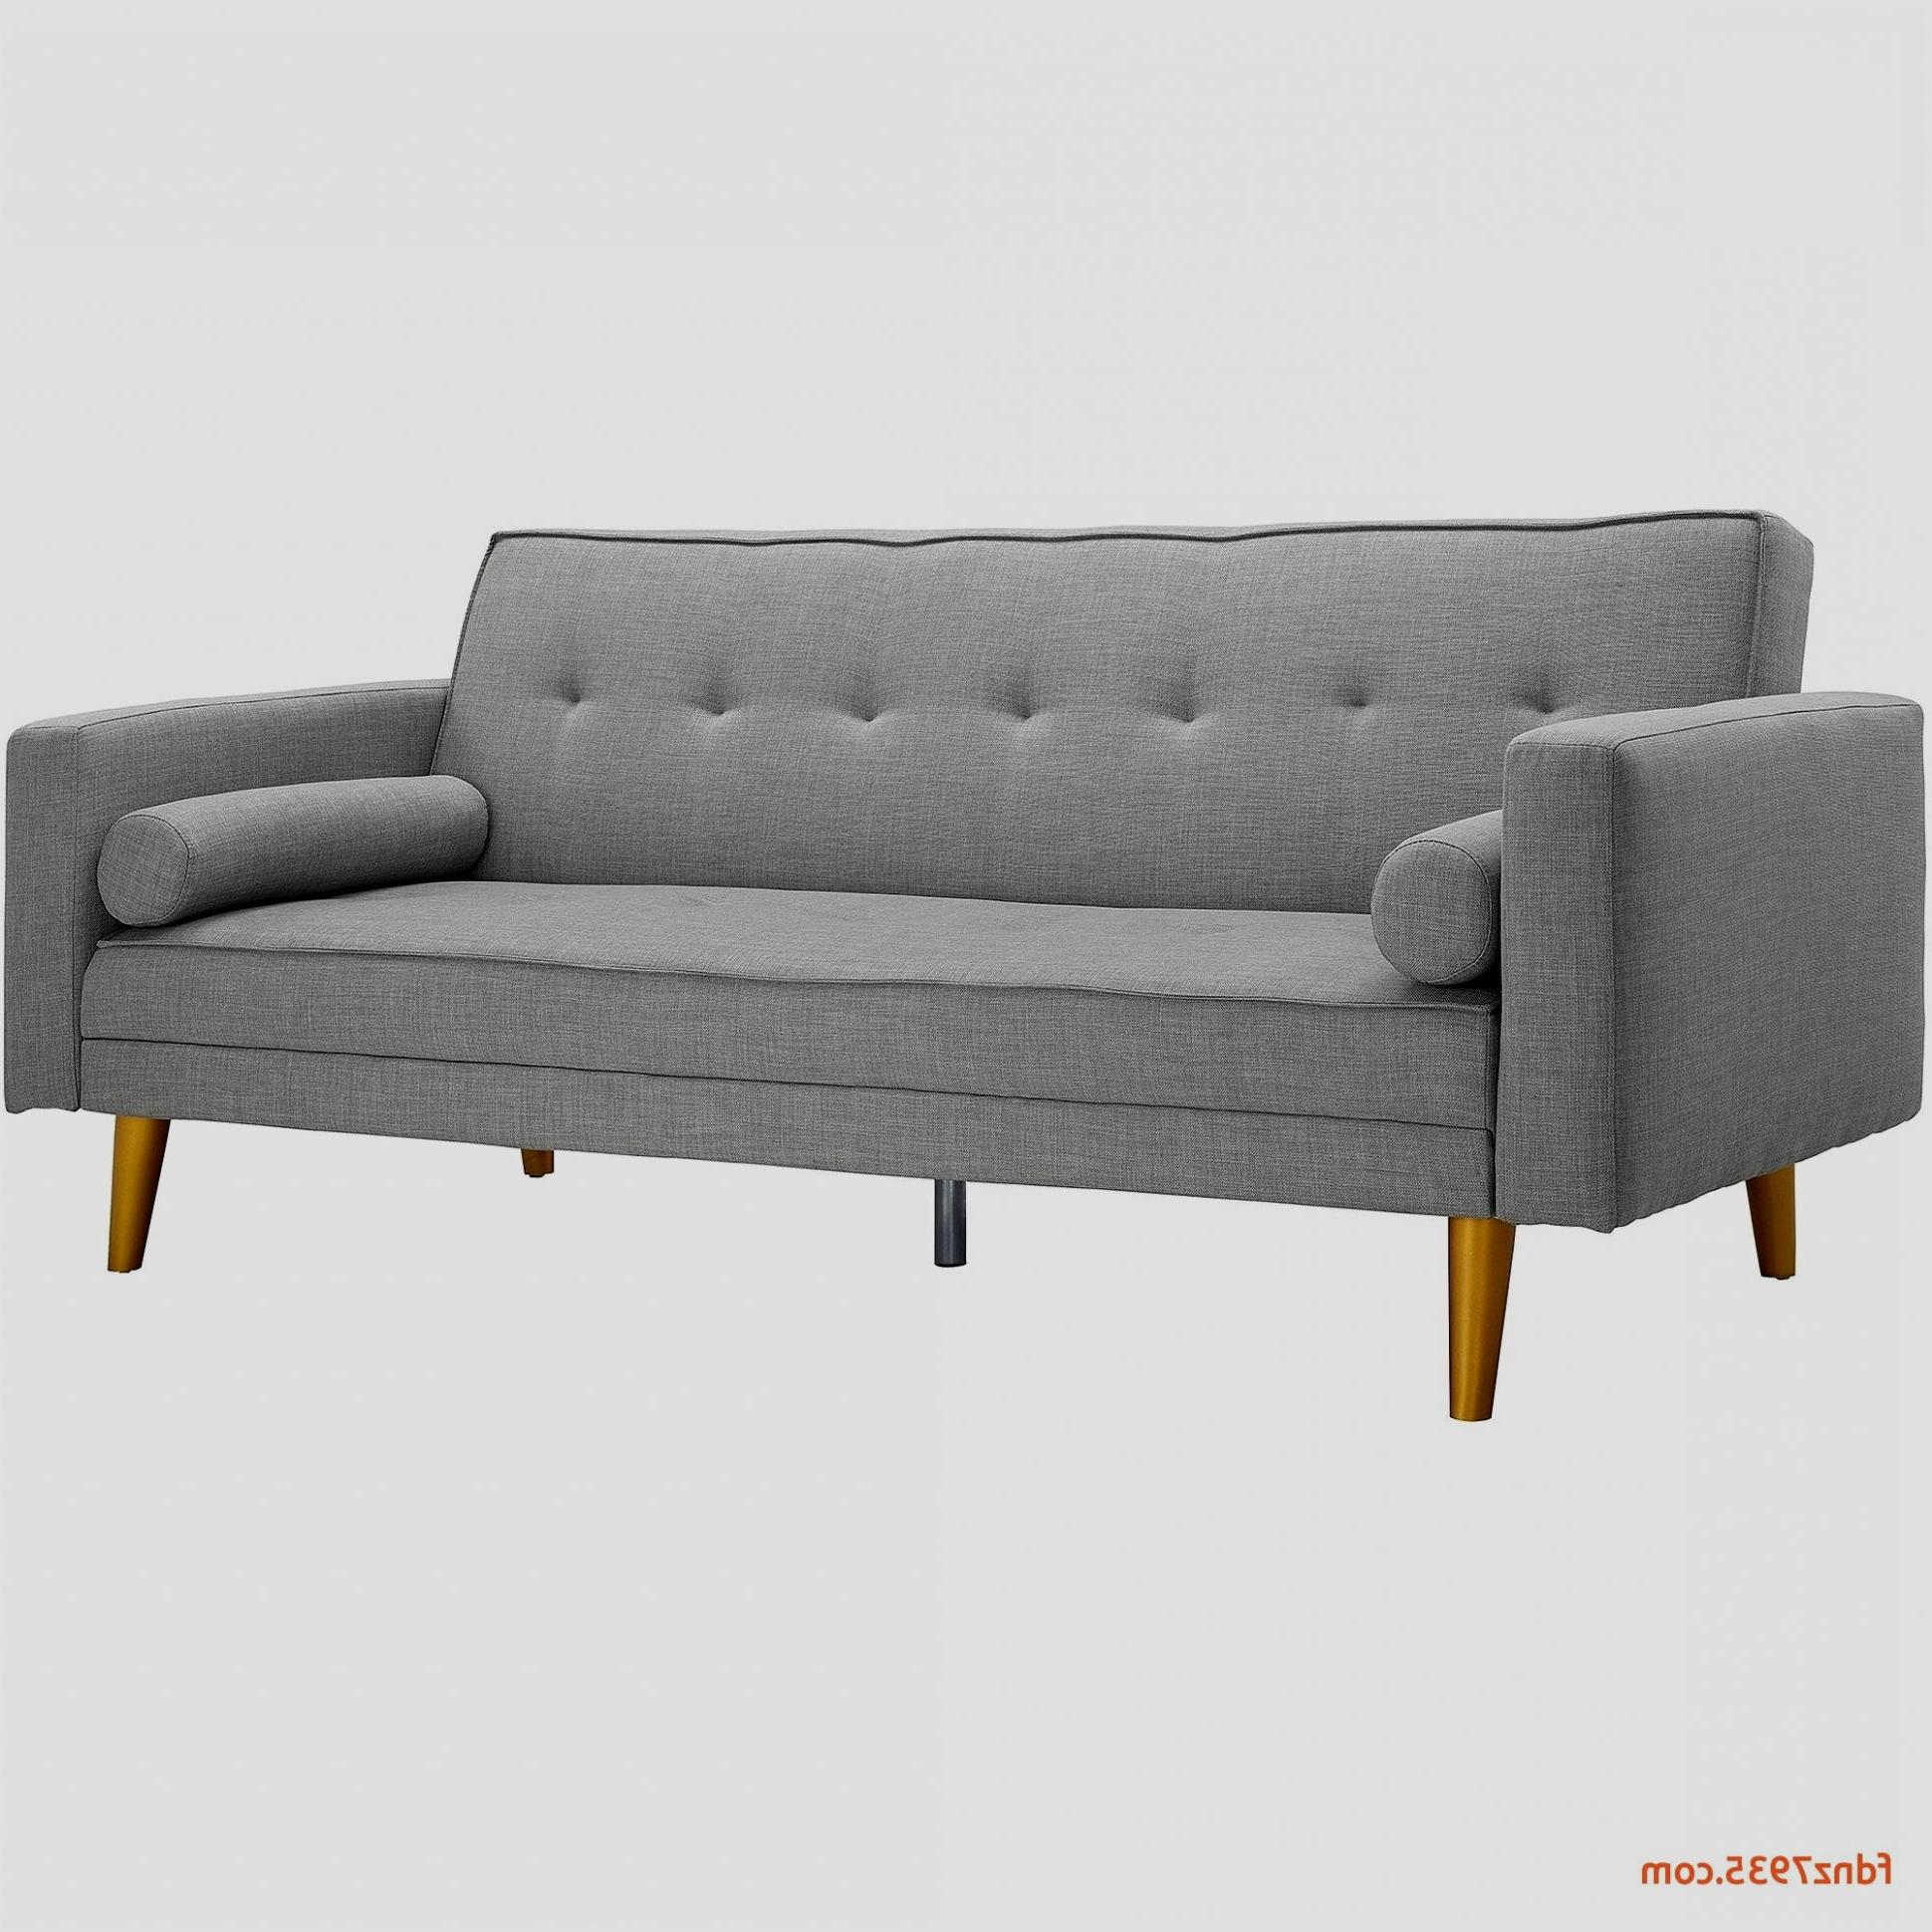 Sofas Esquineros Baratos Dddy sofas Esquineros Baratos Agradable sofa Chaise Longue Gris Plan